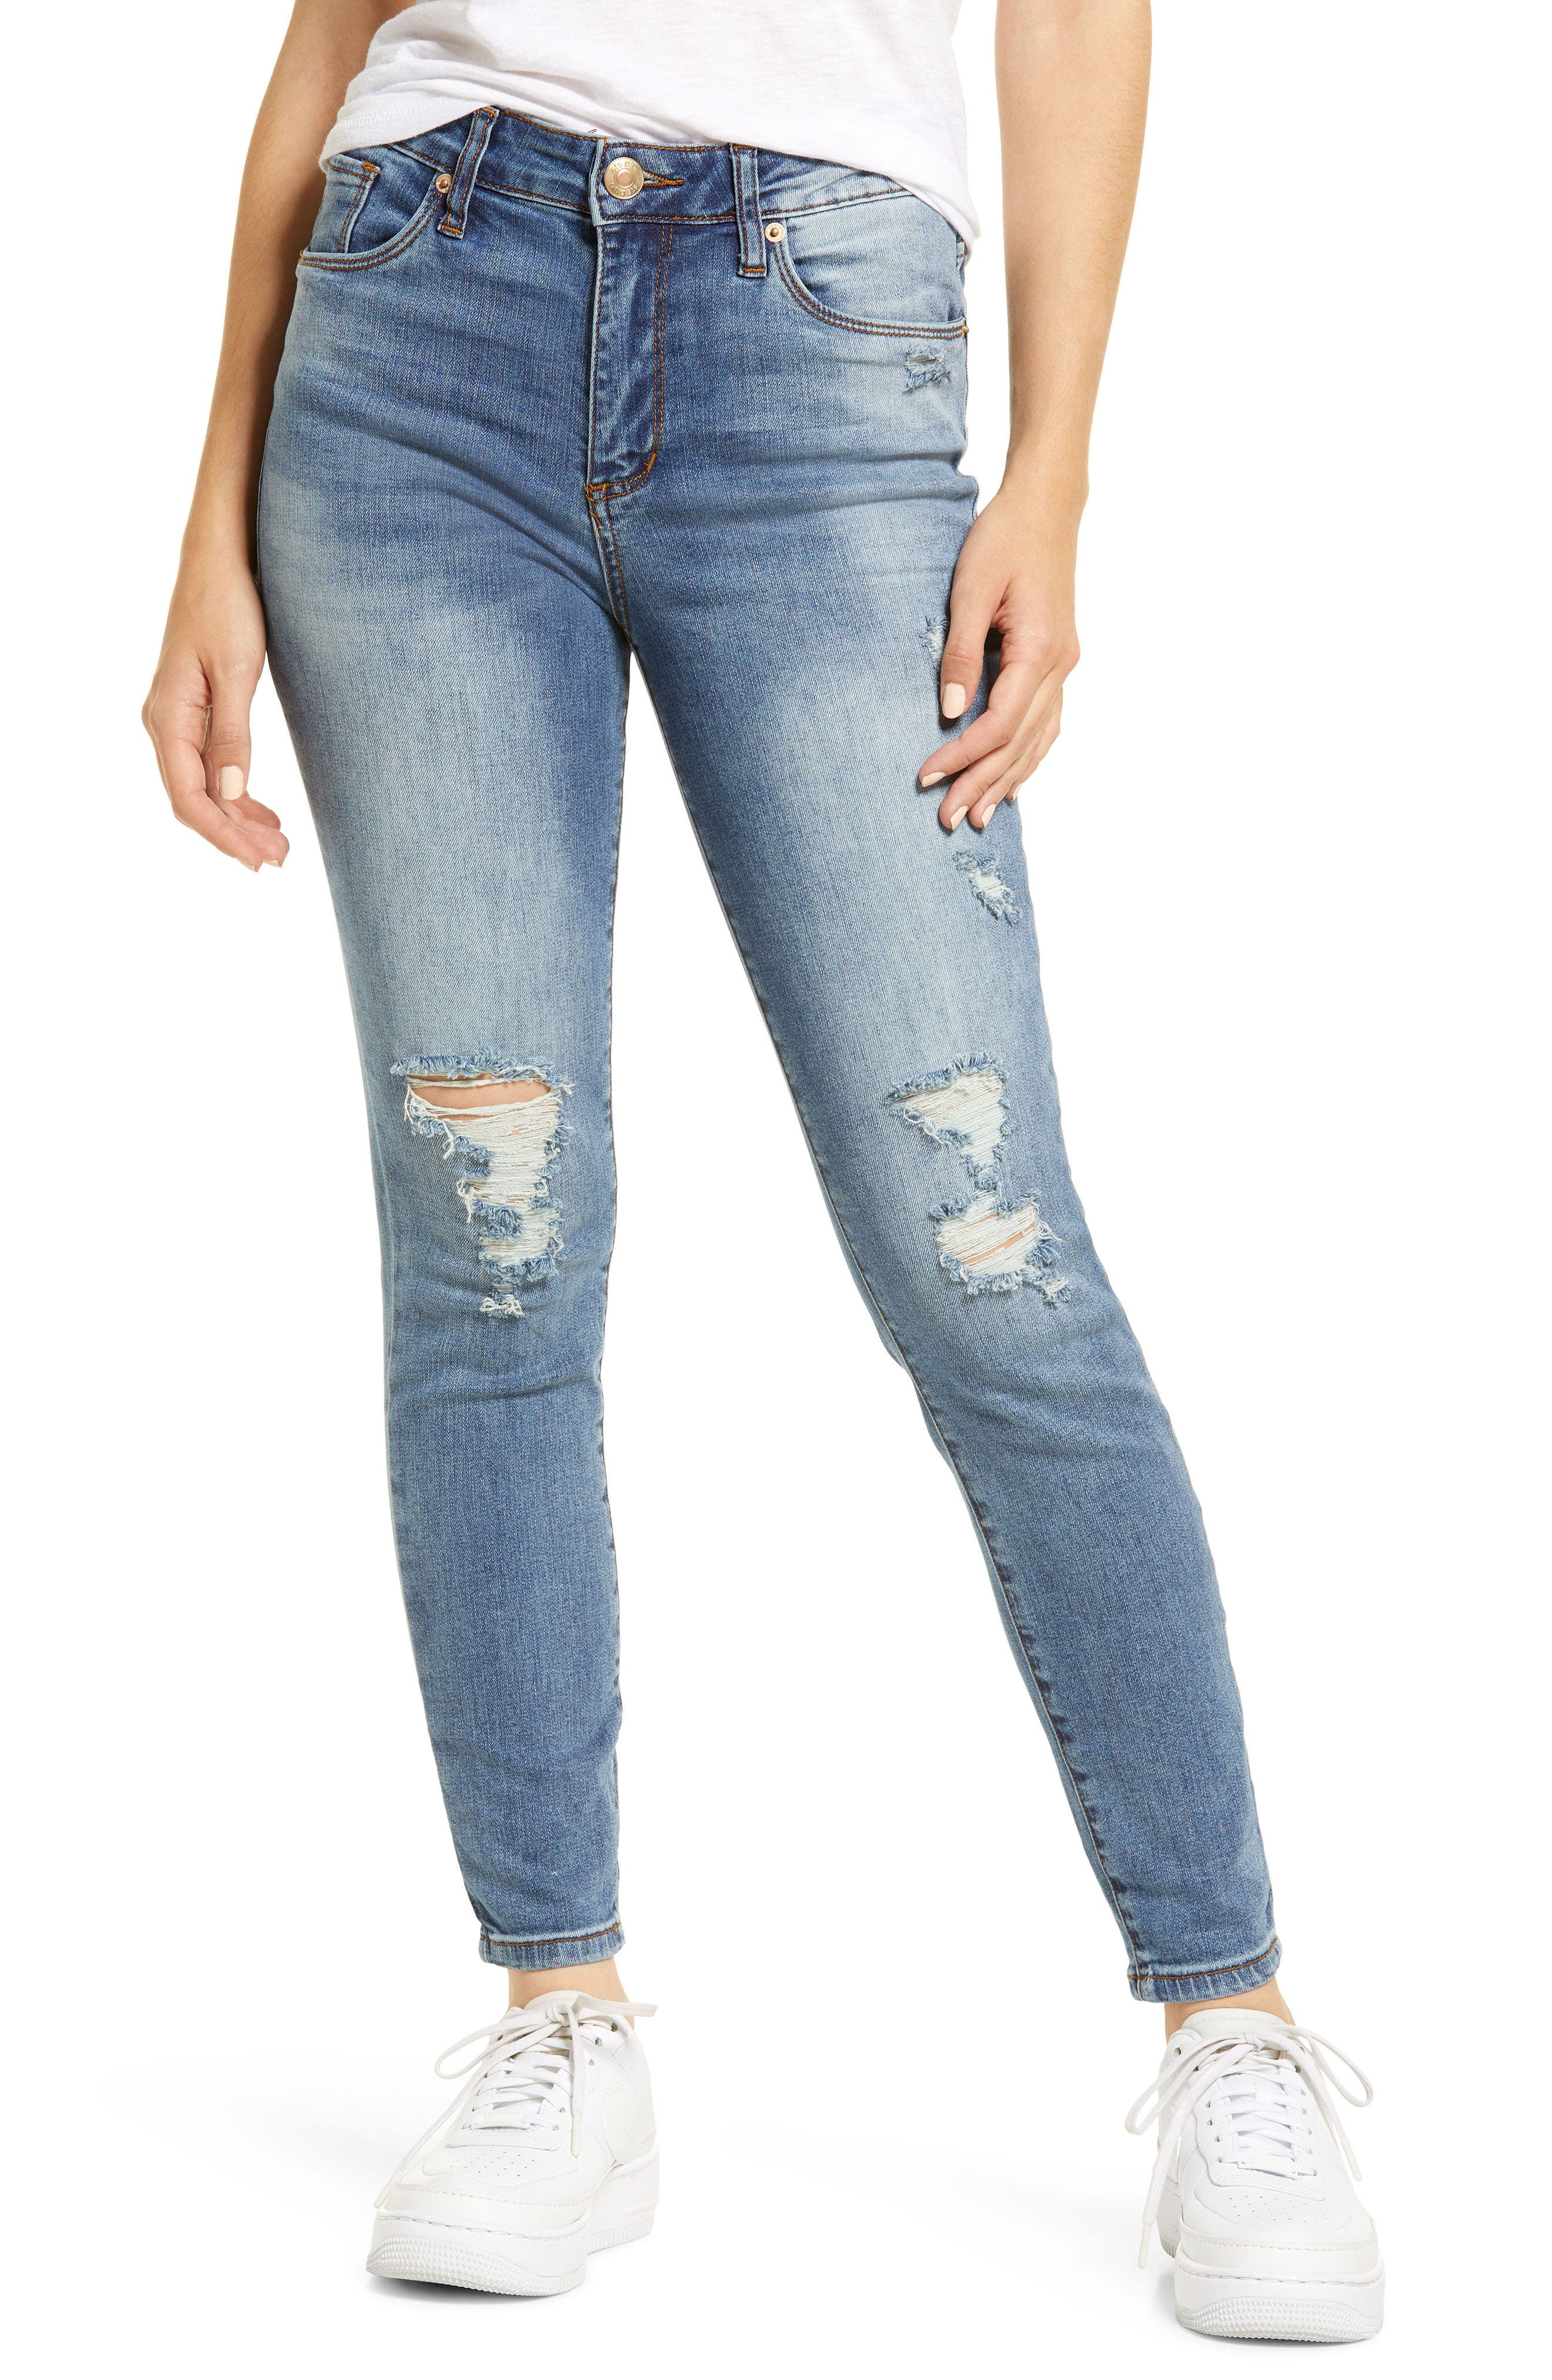 Ellie High Waist Ankle Skinny Jeans